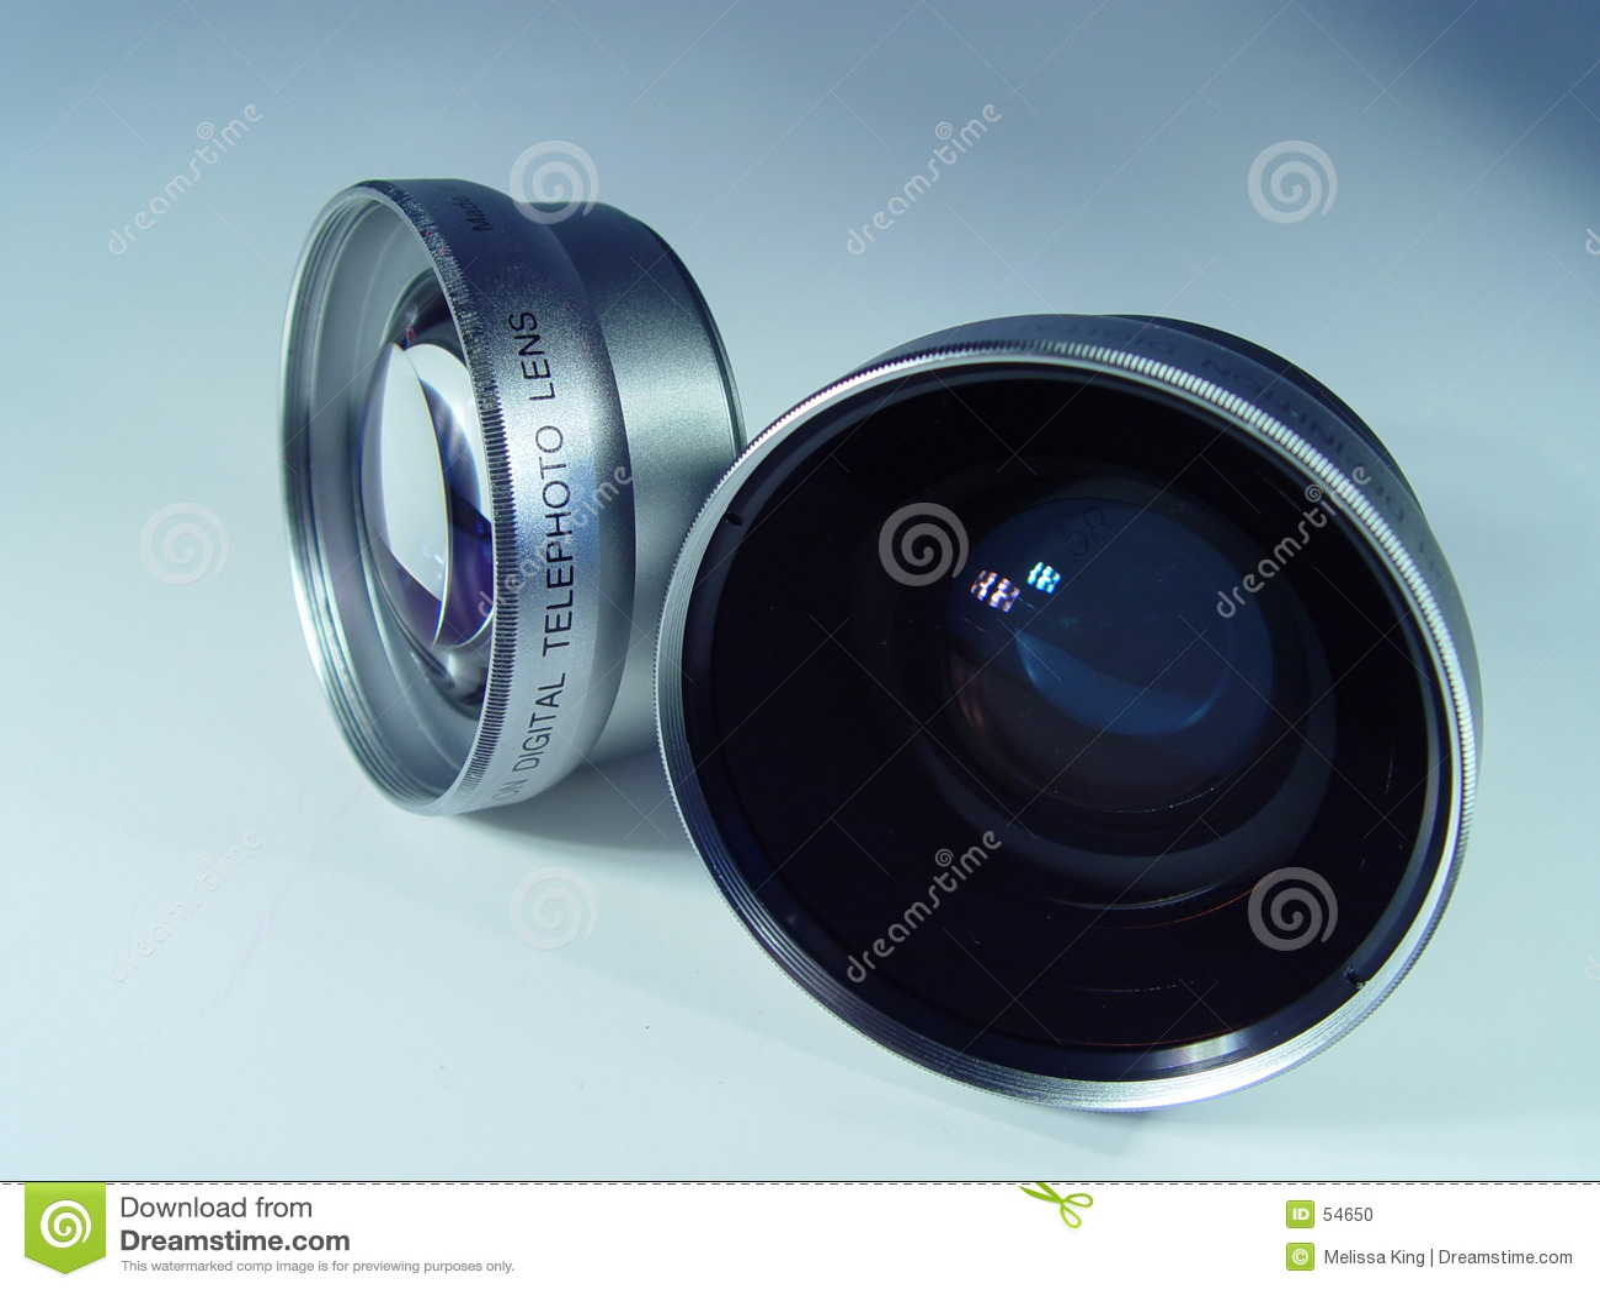 Download φακός δύο φωτογραφικών μηχανών Στοκ Εικόνες - εικόνα από χάλυβας, στοιχεία: 54650